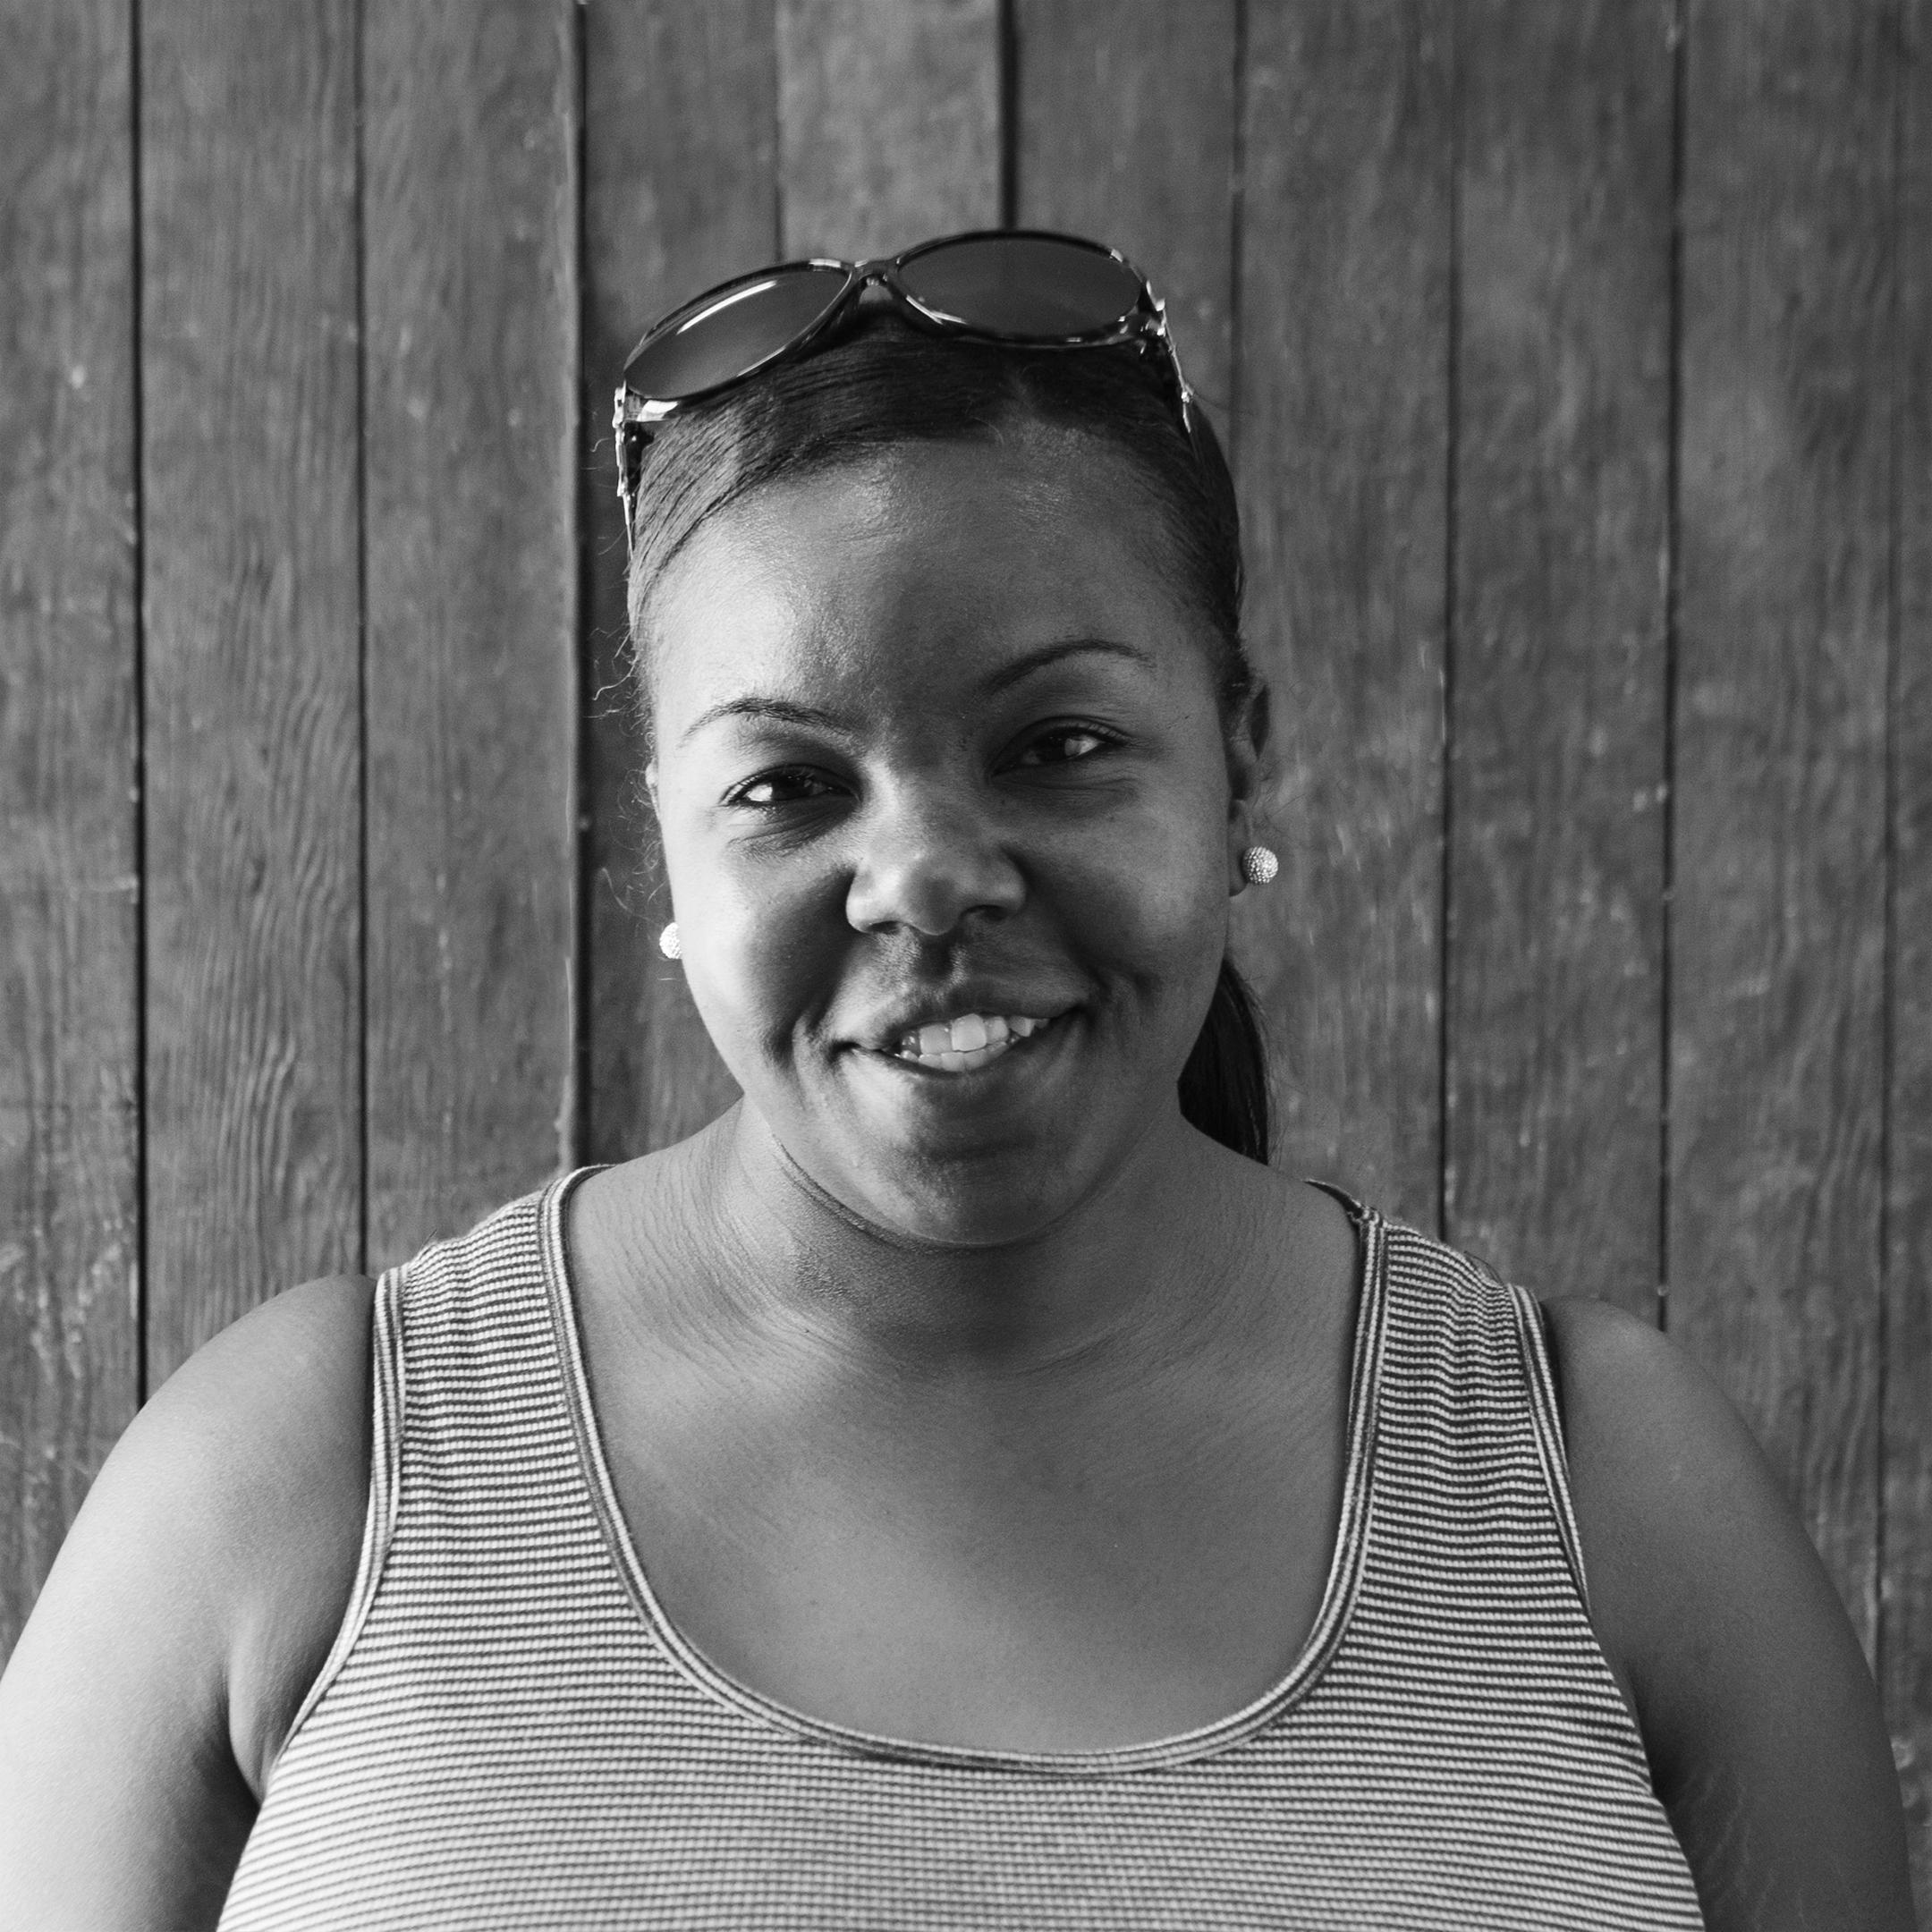 Essie Davis,Melody Anderson born December 3, 1955 (age 62) XXX images Tracy Nelson born October 25, 1963 (age 55),Rachna Banerjee